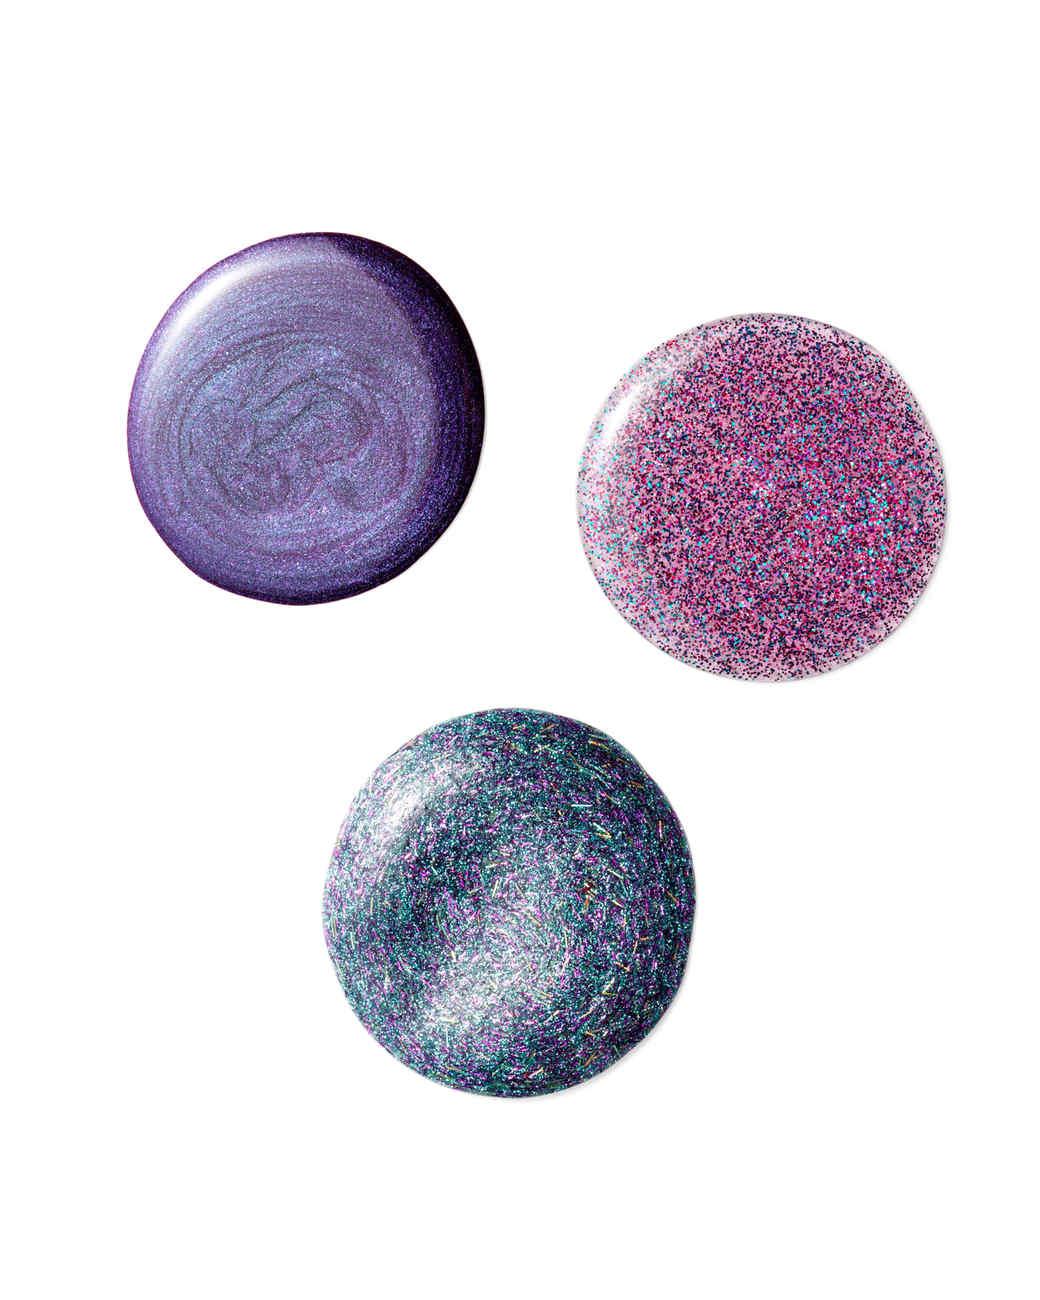 nail-polish-purpleblues-msl0612.jpg